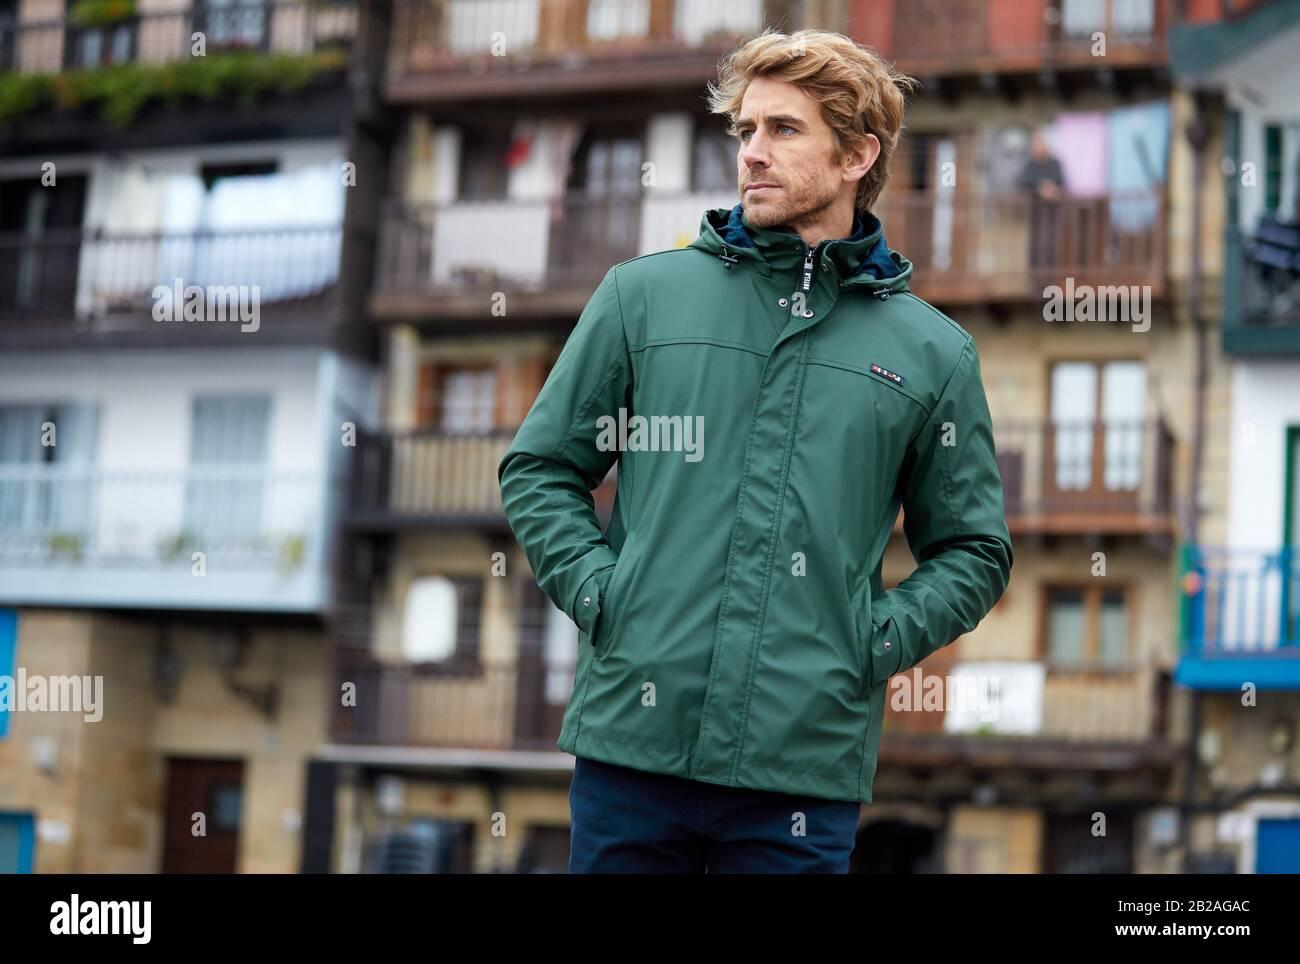 Mid-adult man, Pasai Donibane, Pasaia, Gipuzkoa, Basque Country, Spain, Europe Stock Photo